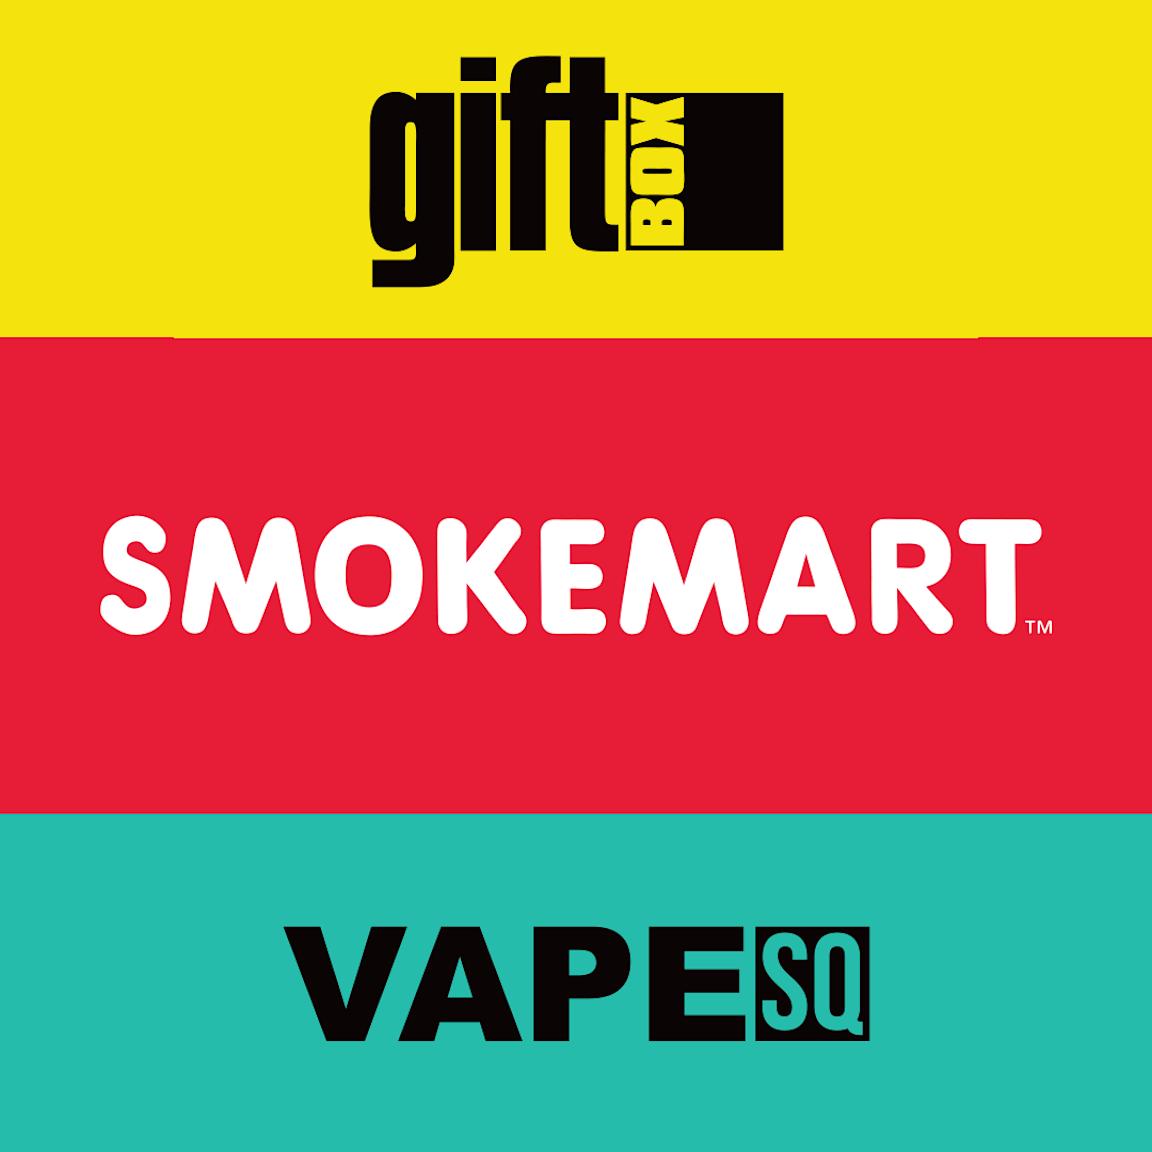 logo for Smokemart GiftBox